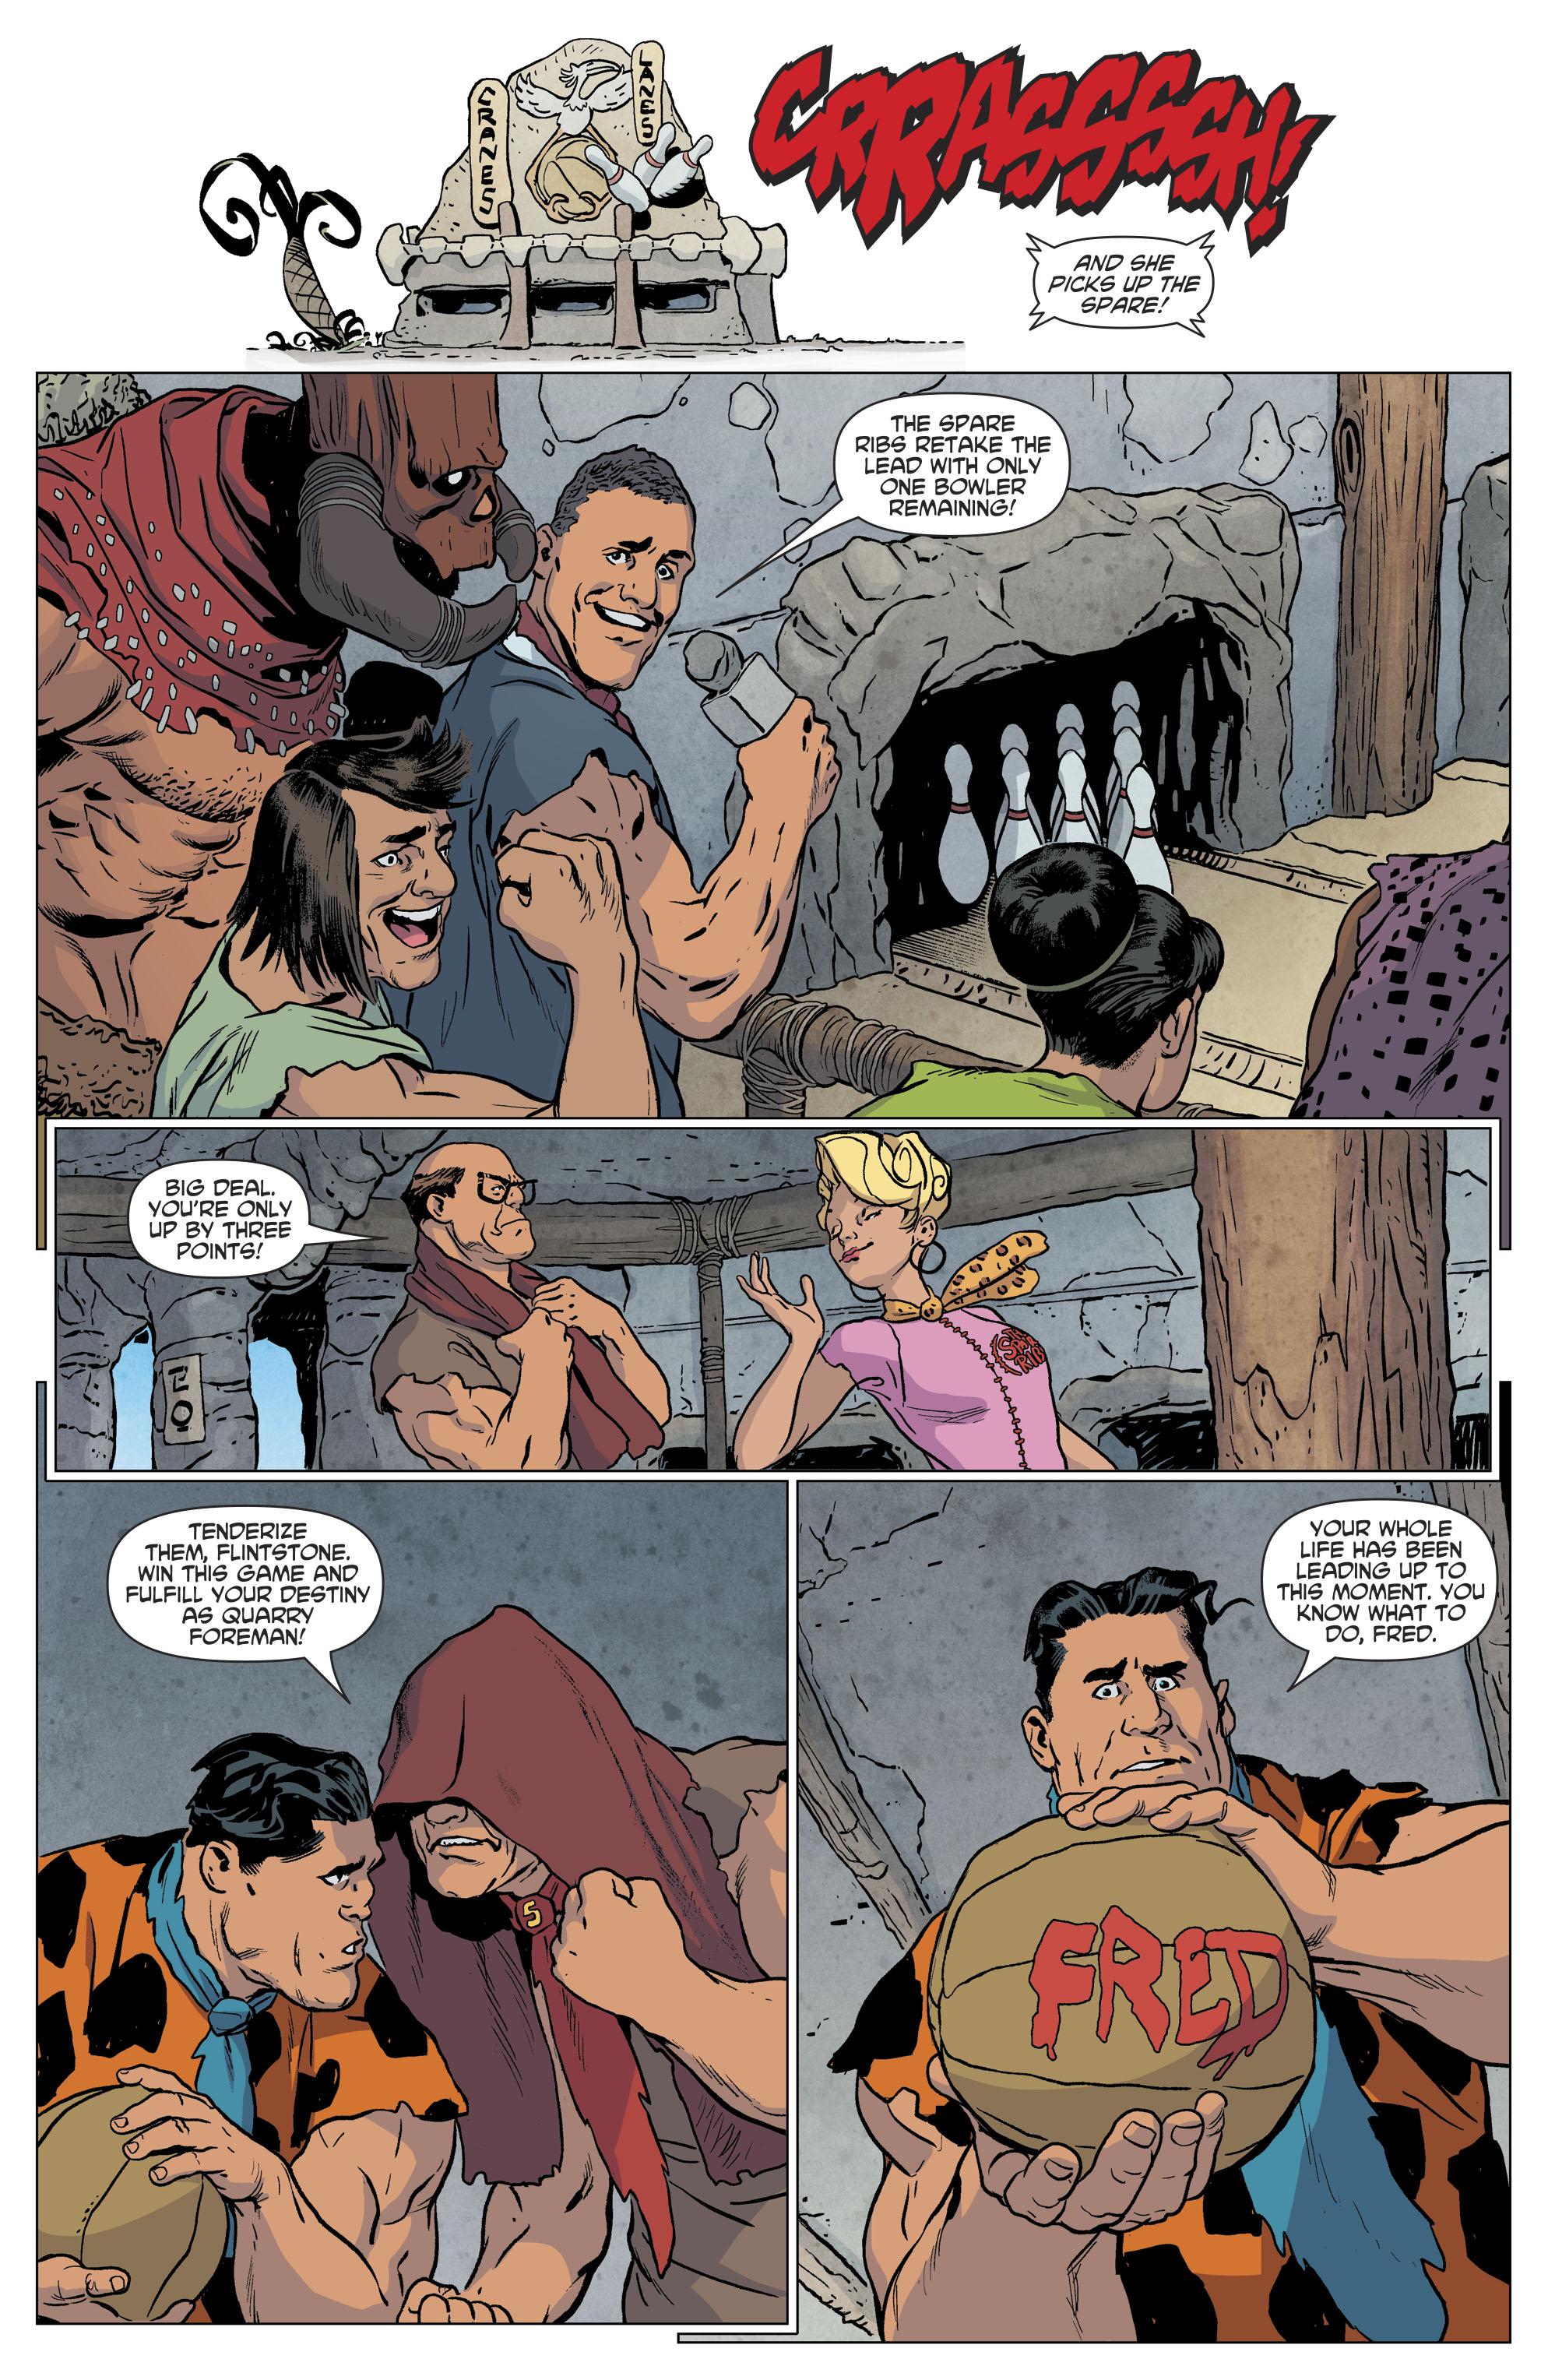 Read online The Flintstones comic -  Issue #12 - 15